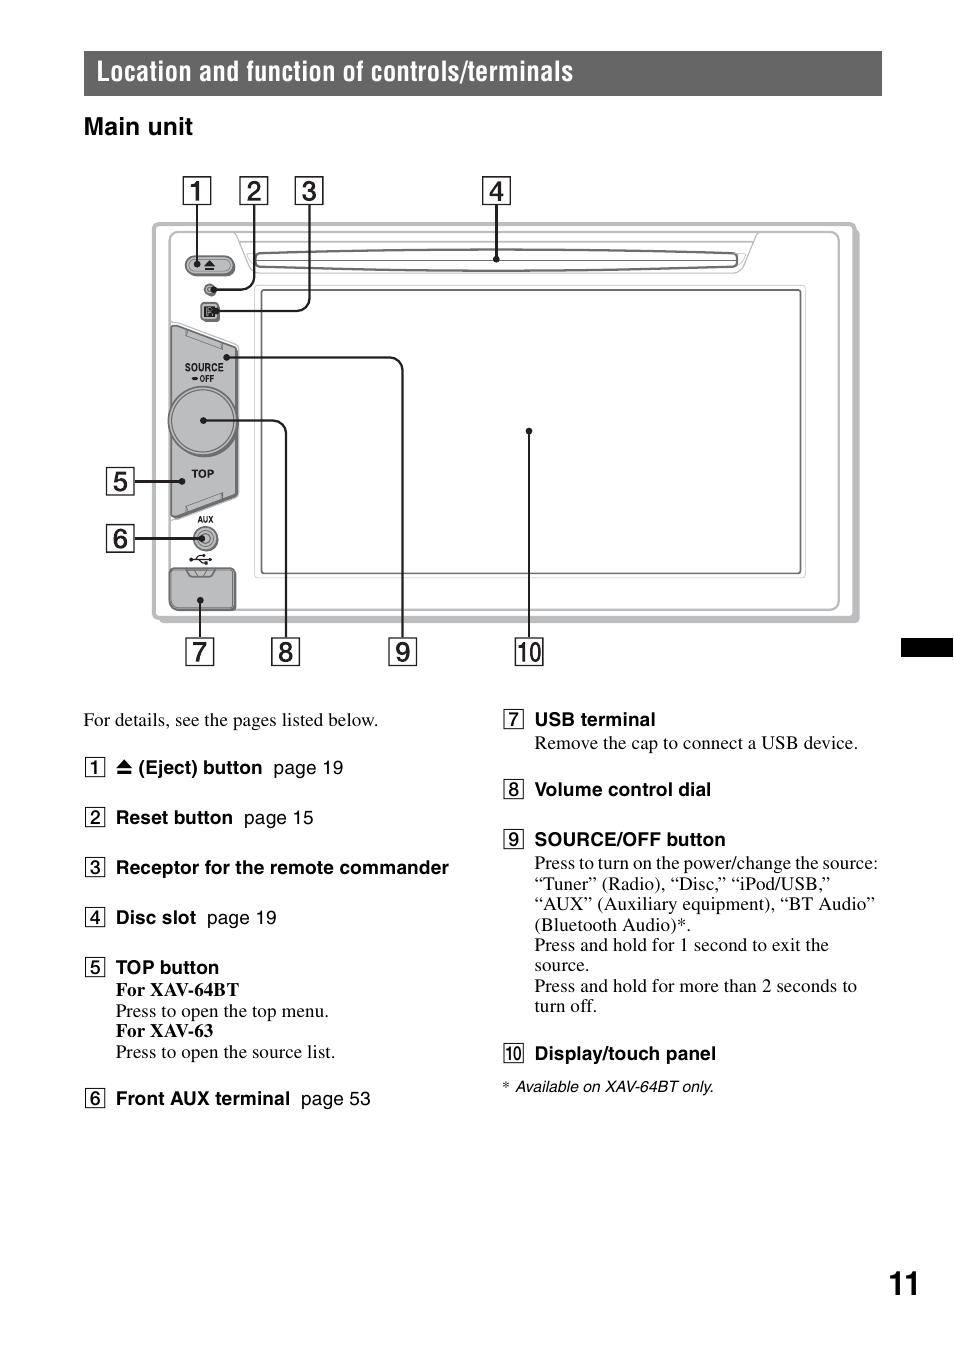 hight resolution of location and function of controls terminals main unit sony xav 63 sony xav 60 manual sony xav 63 wiring diagram